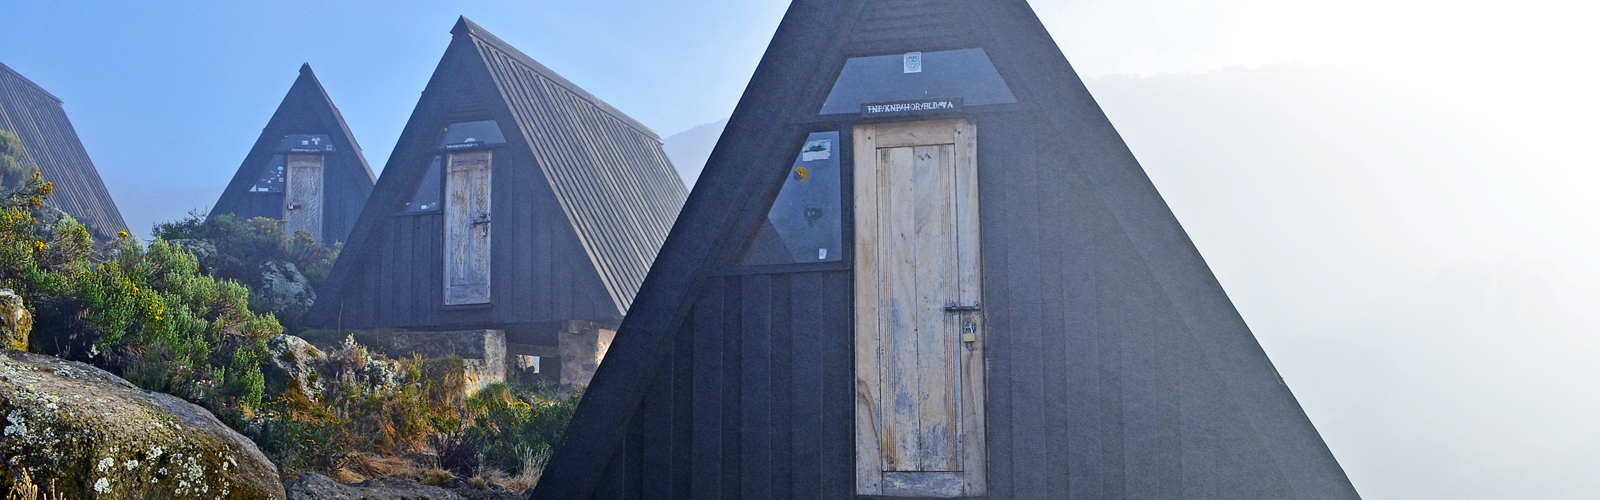 Huts at Horombo